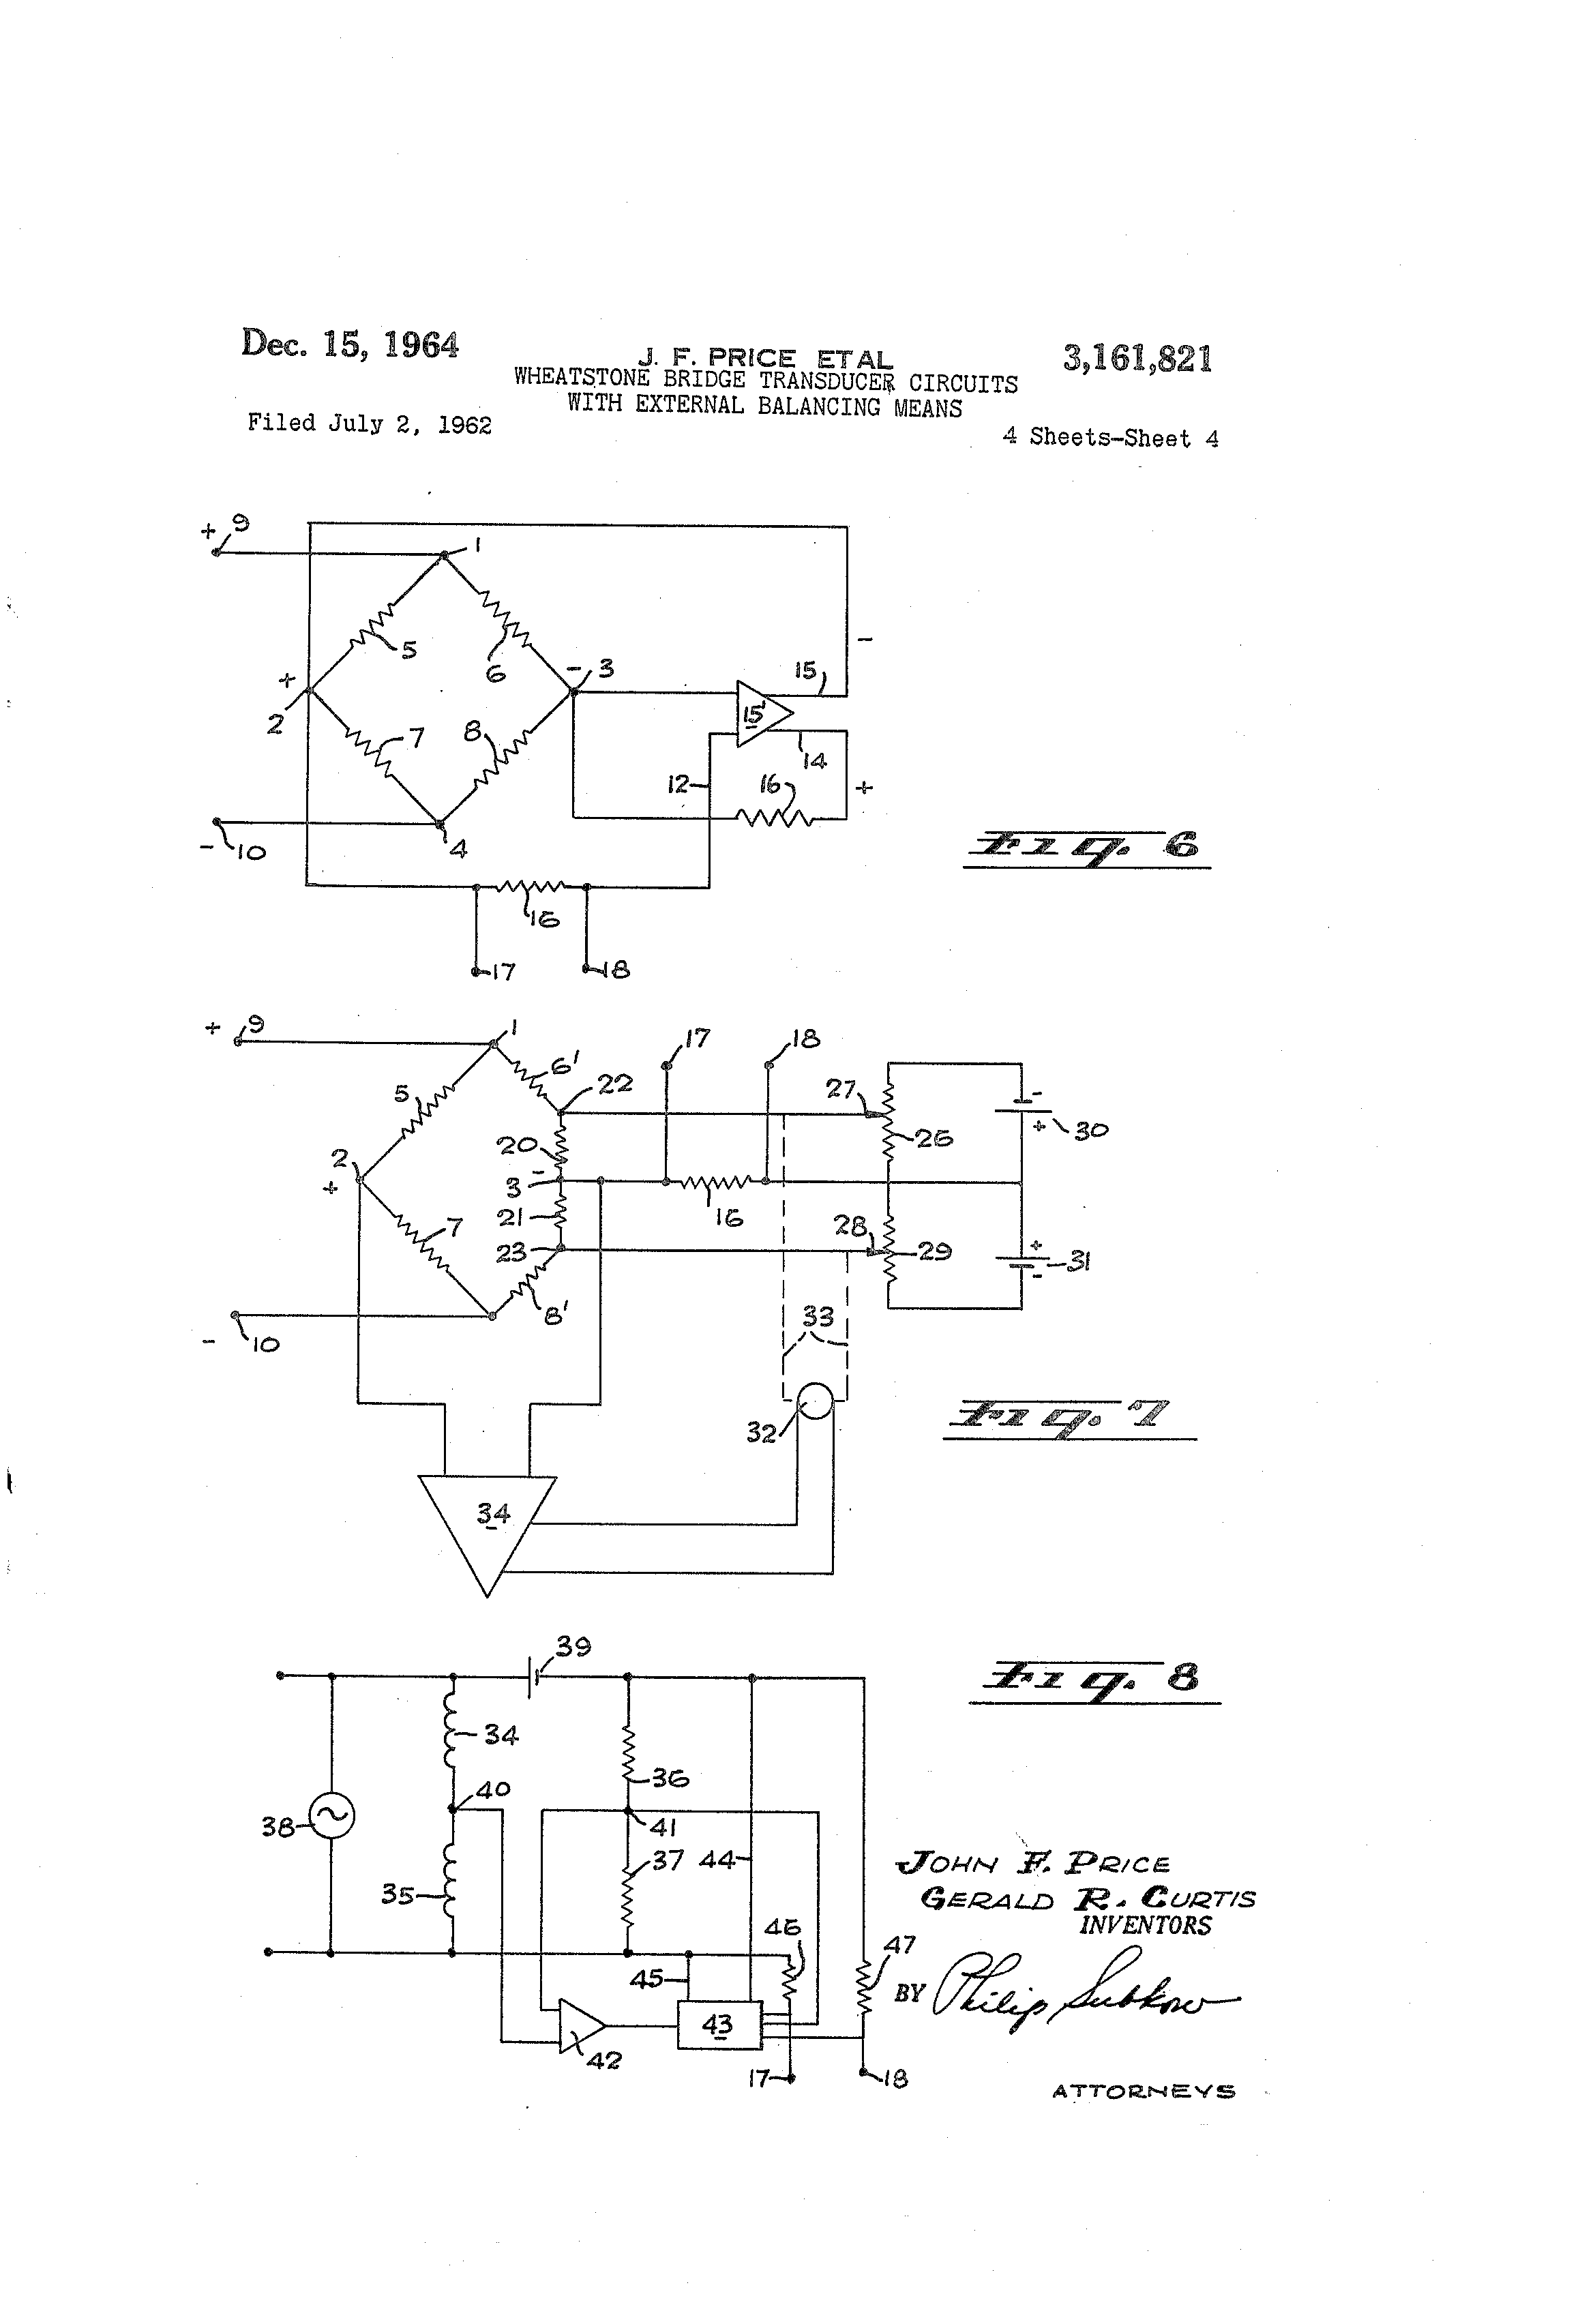 Wheatstone Bridge Circuit Electrical Circuits Of An Showing The Free